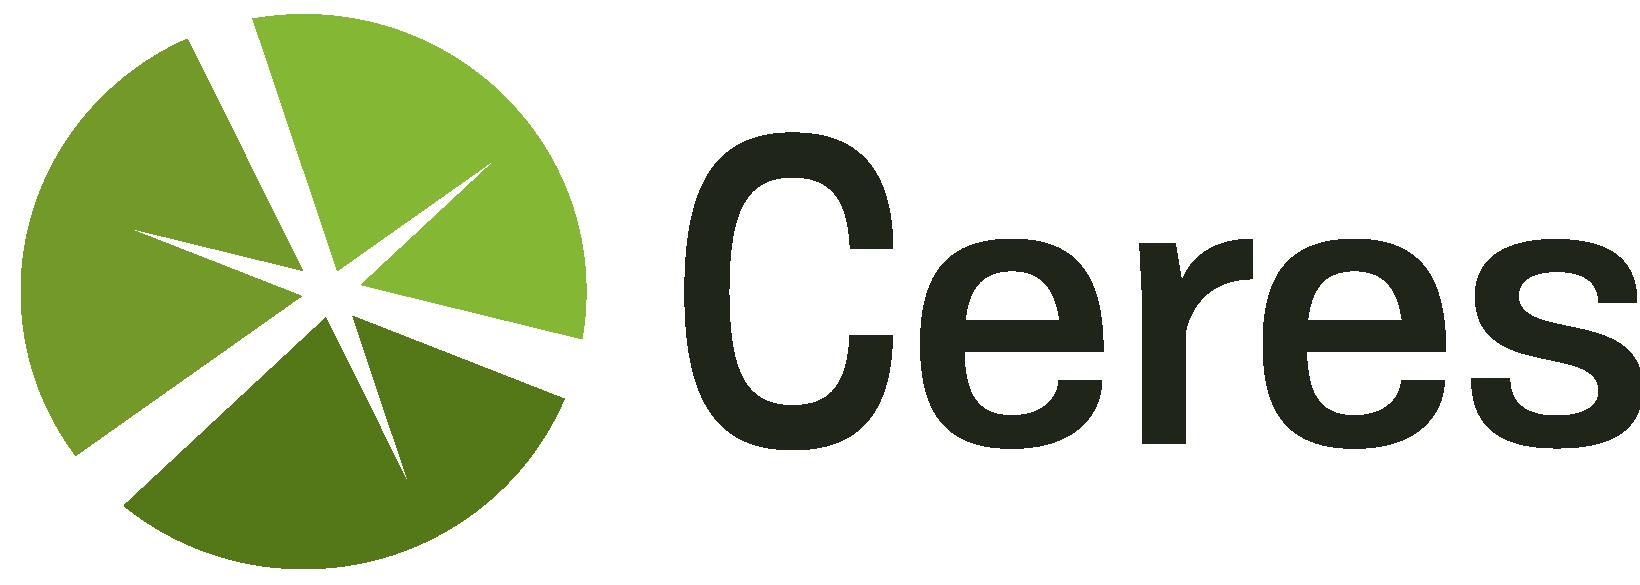 https://www.joshswaterjobs.com/wp-content/uploads/2021/06/ceres-logo-4C-hires.png